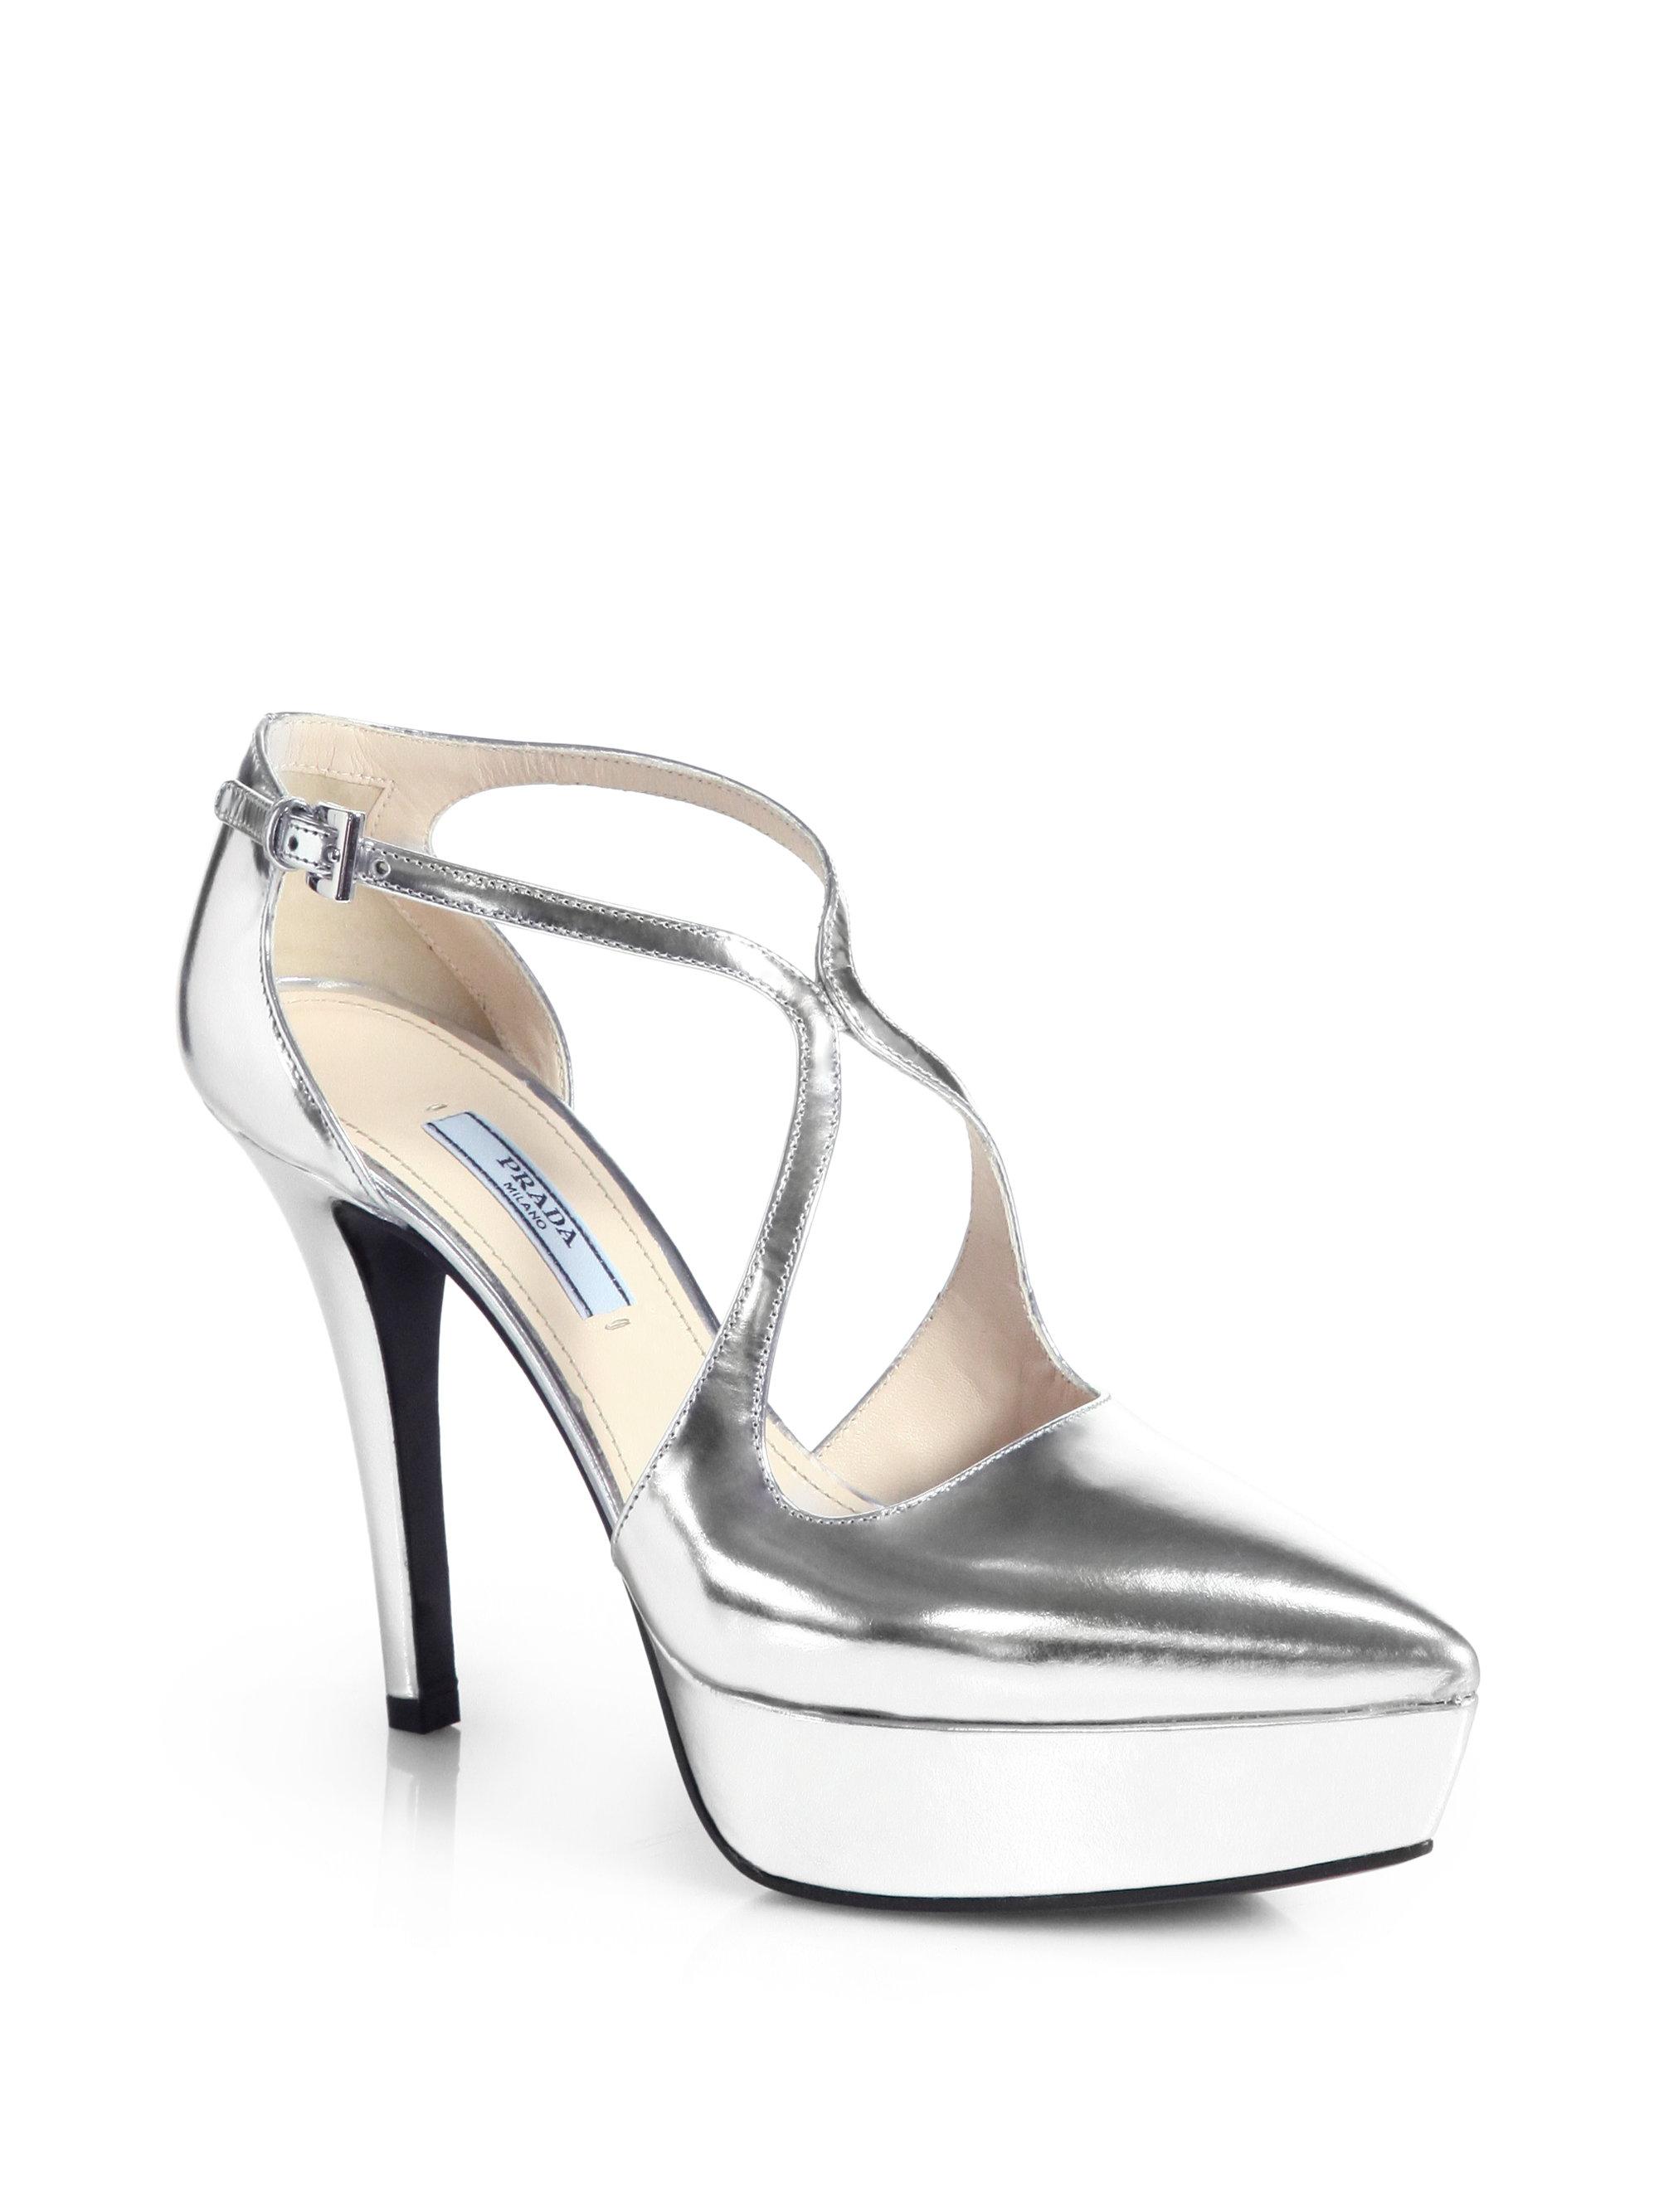 6e1cf8bf1ab Silver Metallic Platform Heels - Ha Heel